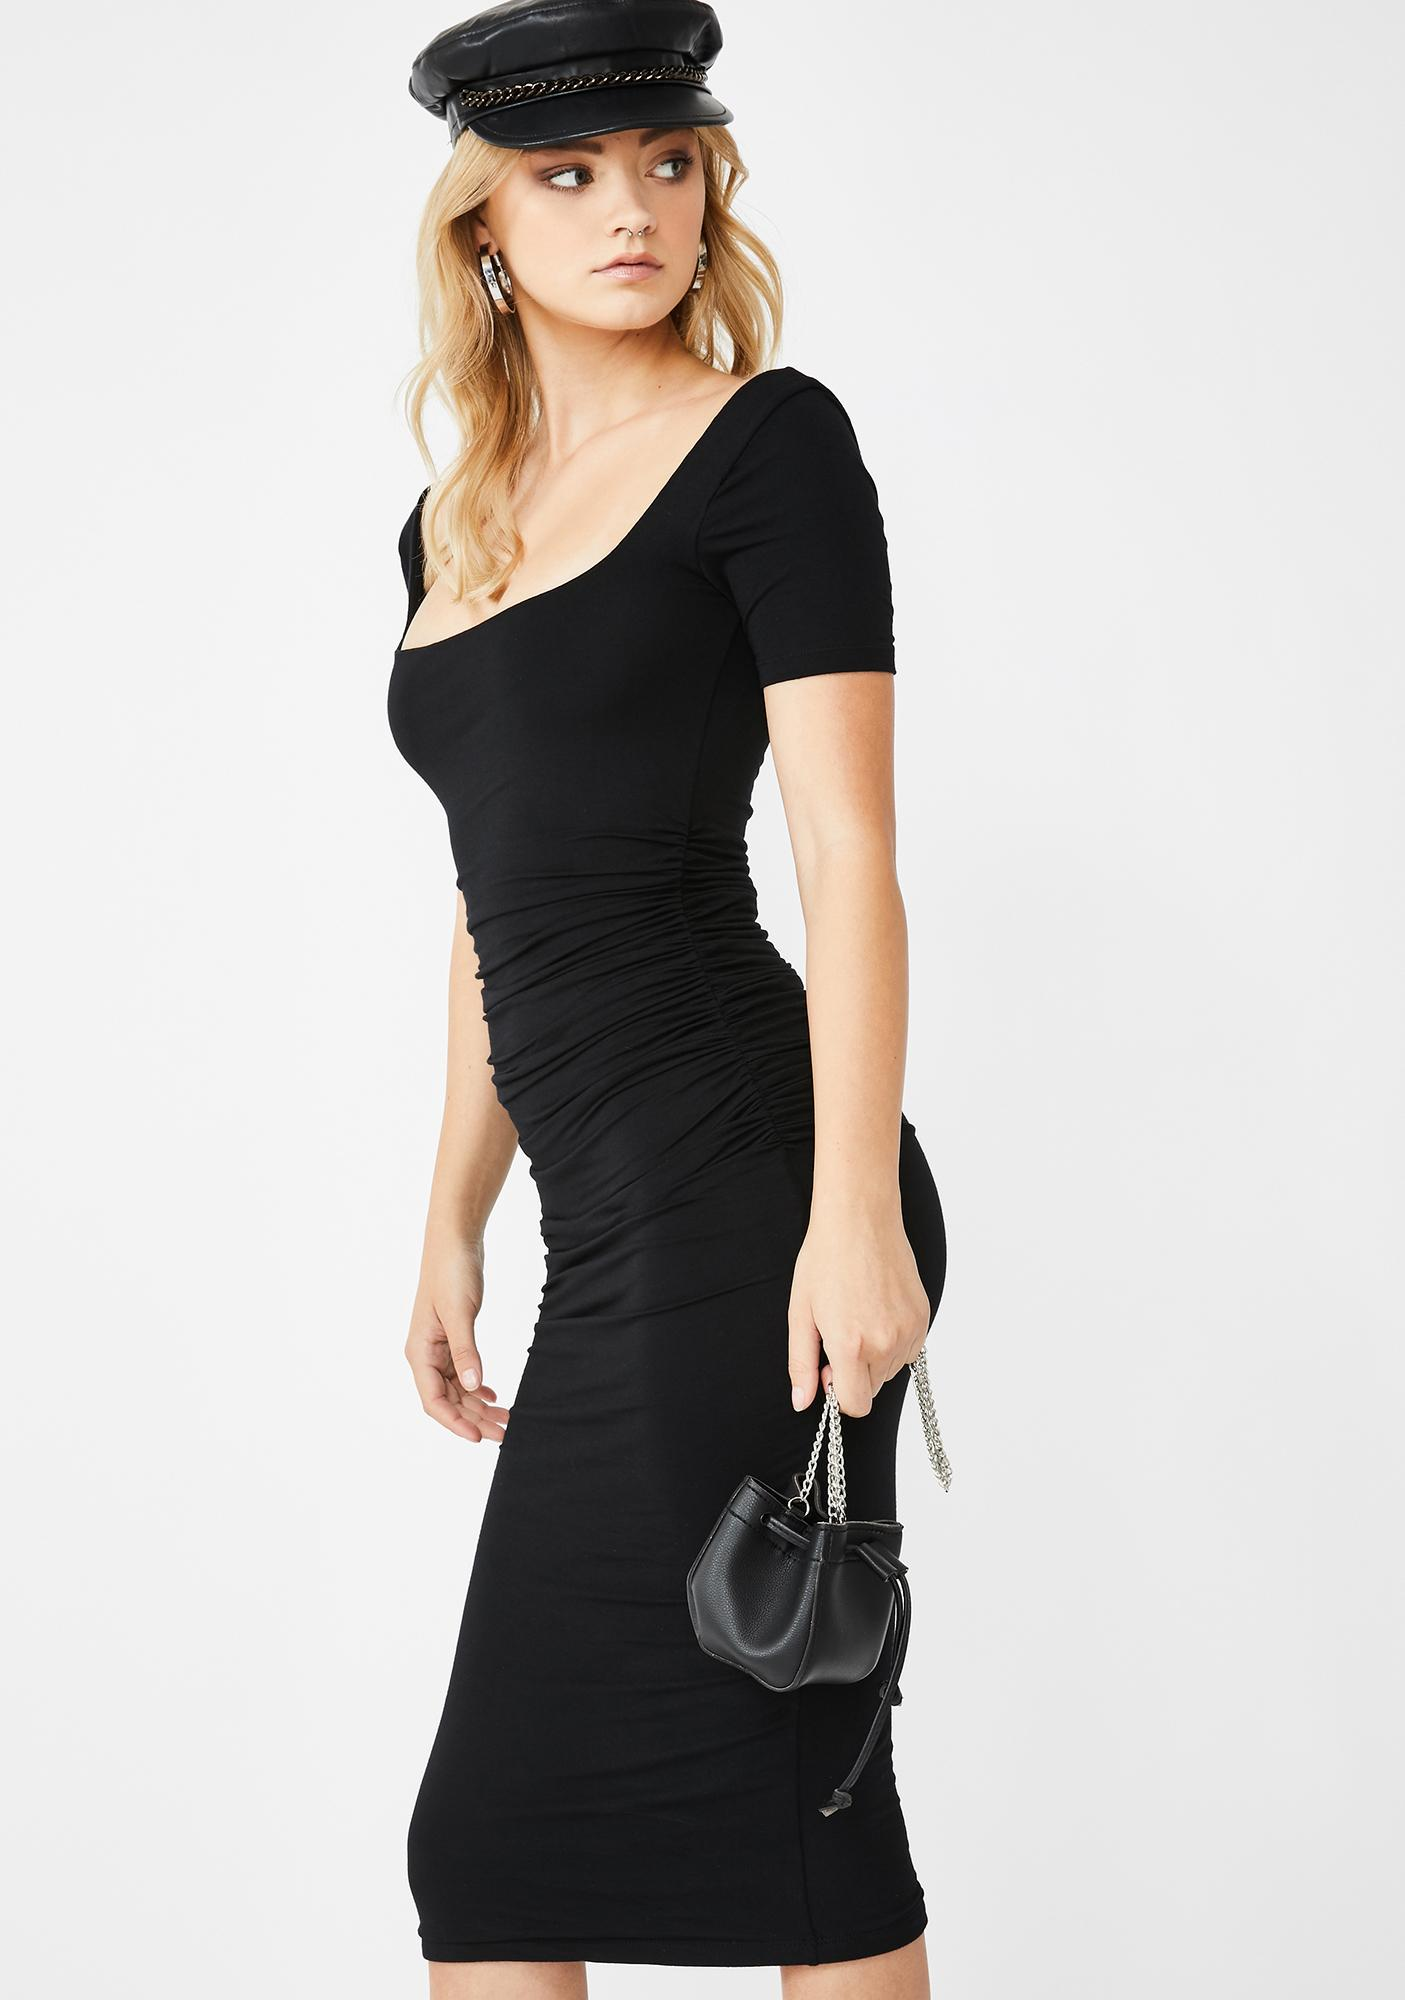 Kiki Riki Lowkey Lovin' Midi Dress